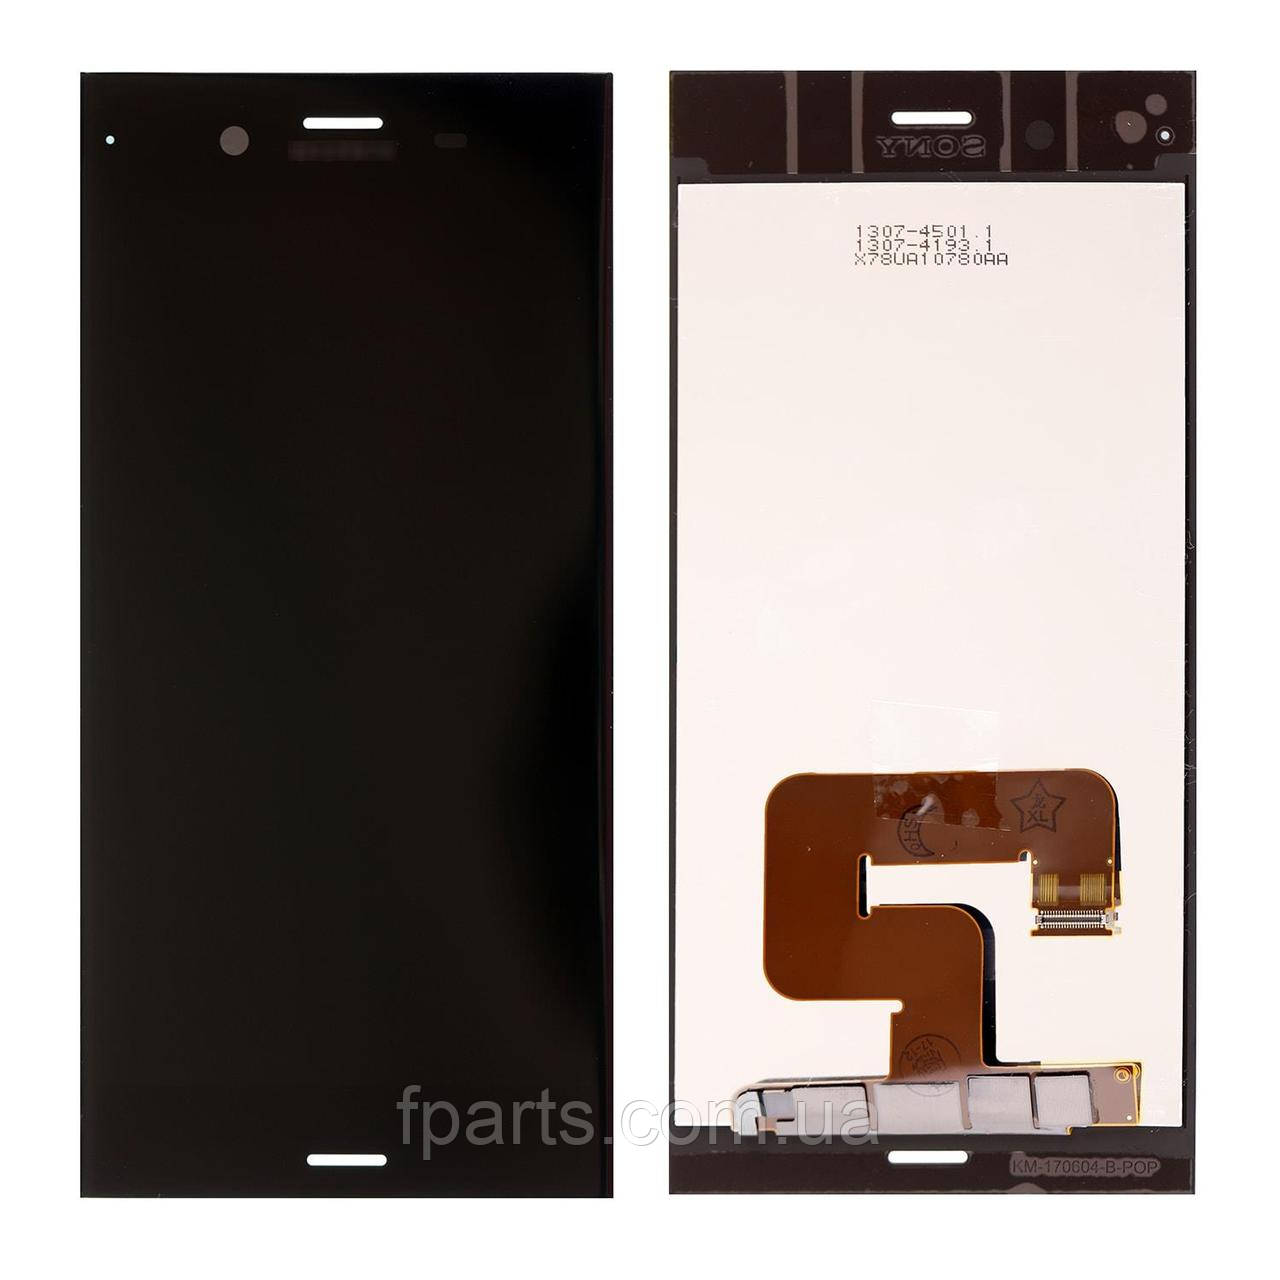 Дисплей для Sony Xperia XZ1 G8342, G8341 с тачскрином (Black)